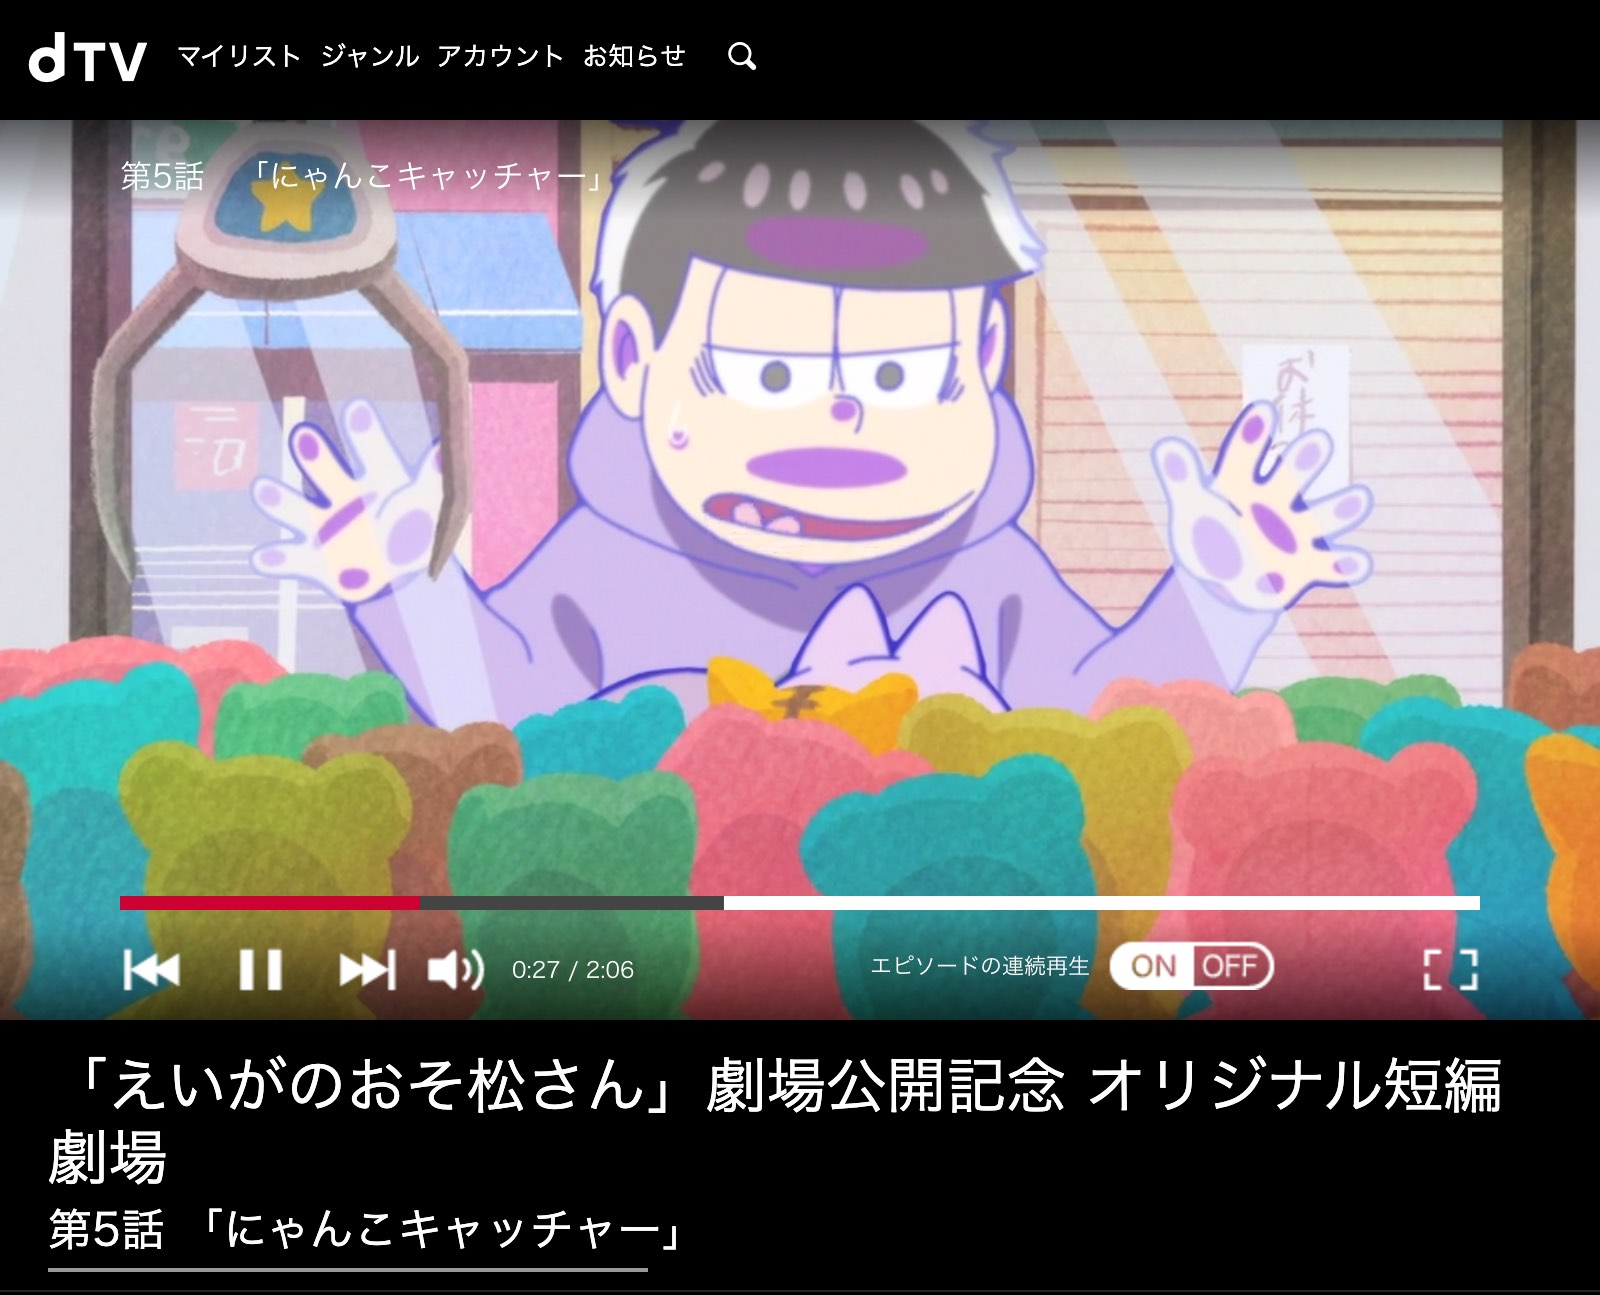 dTV 再生画面